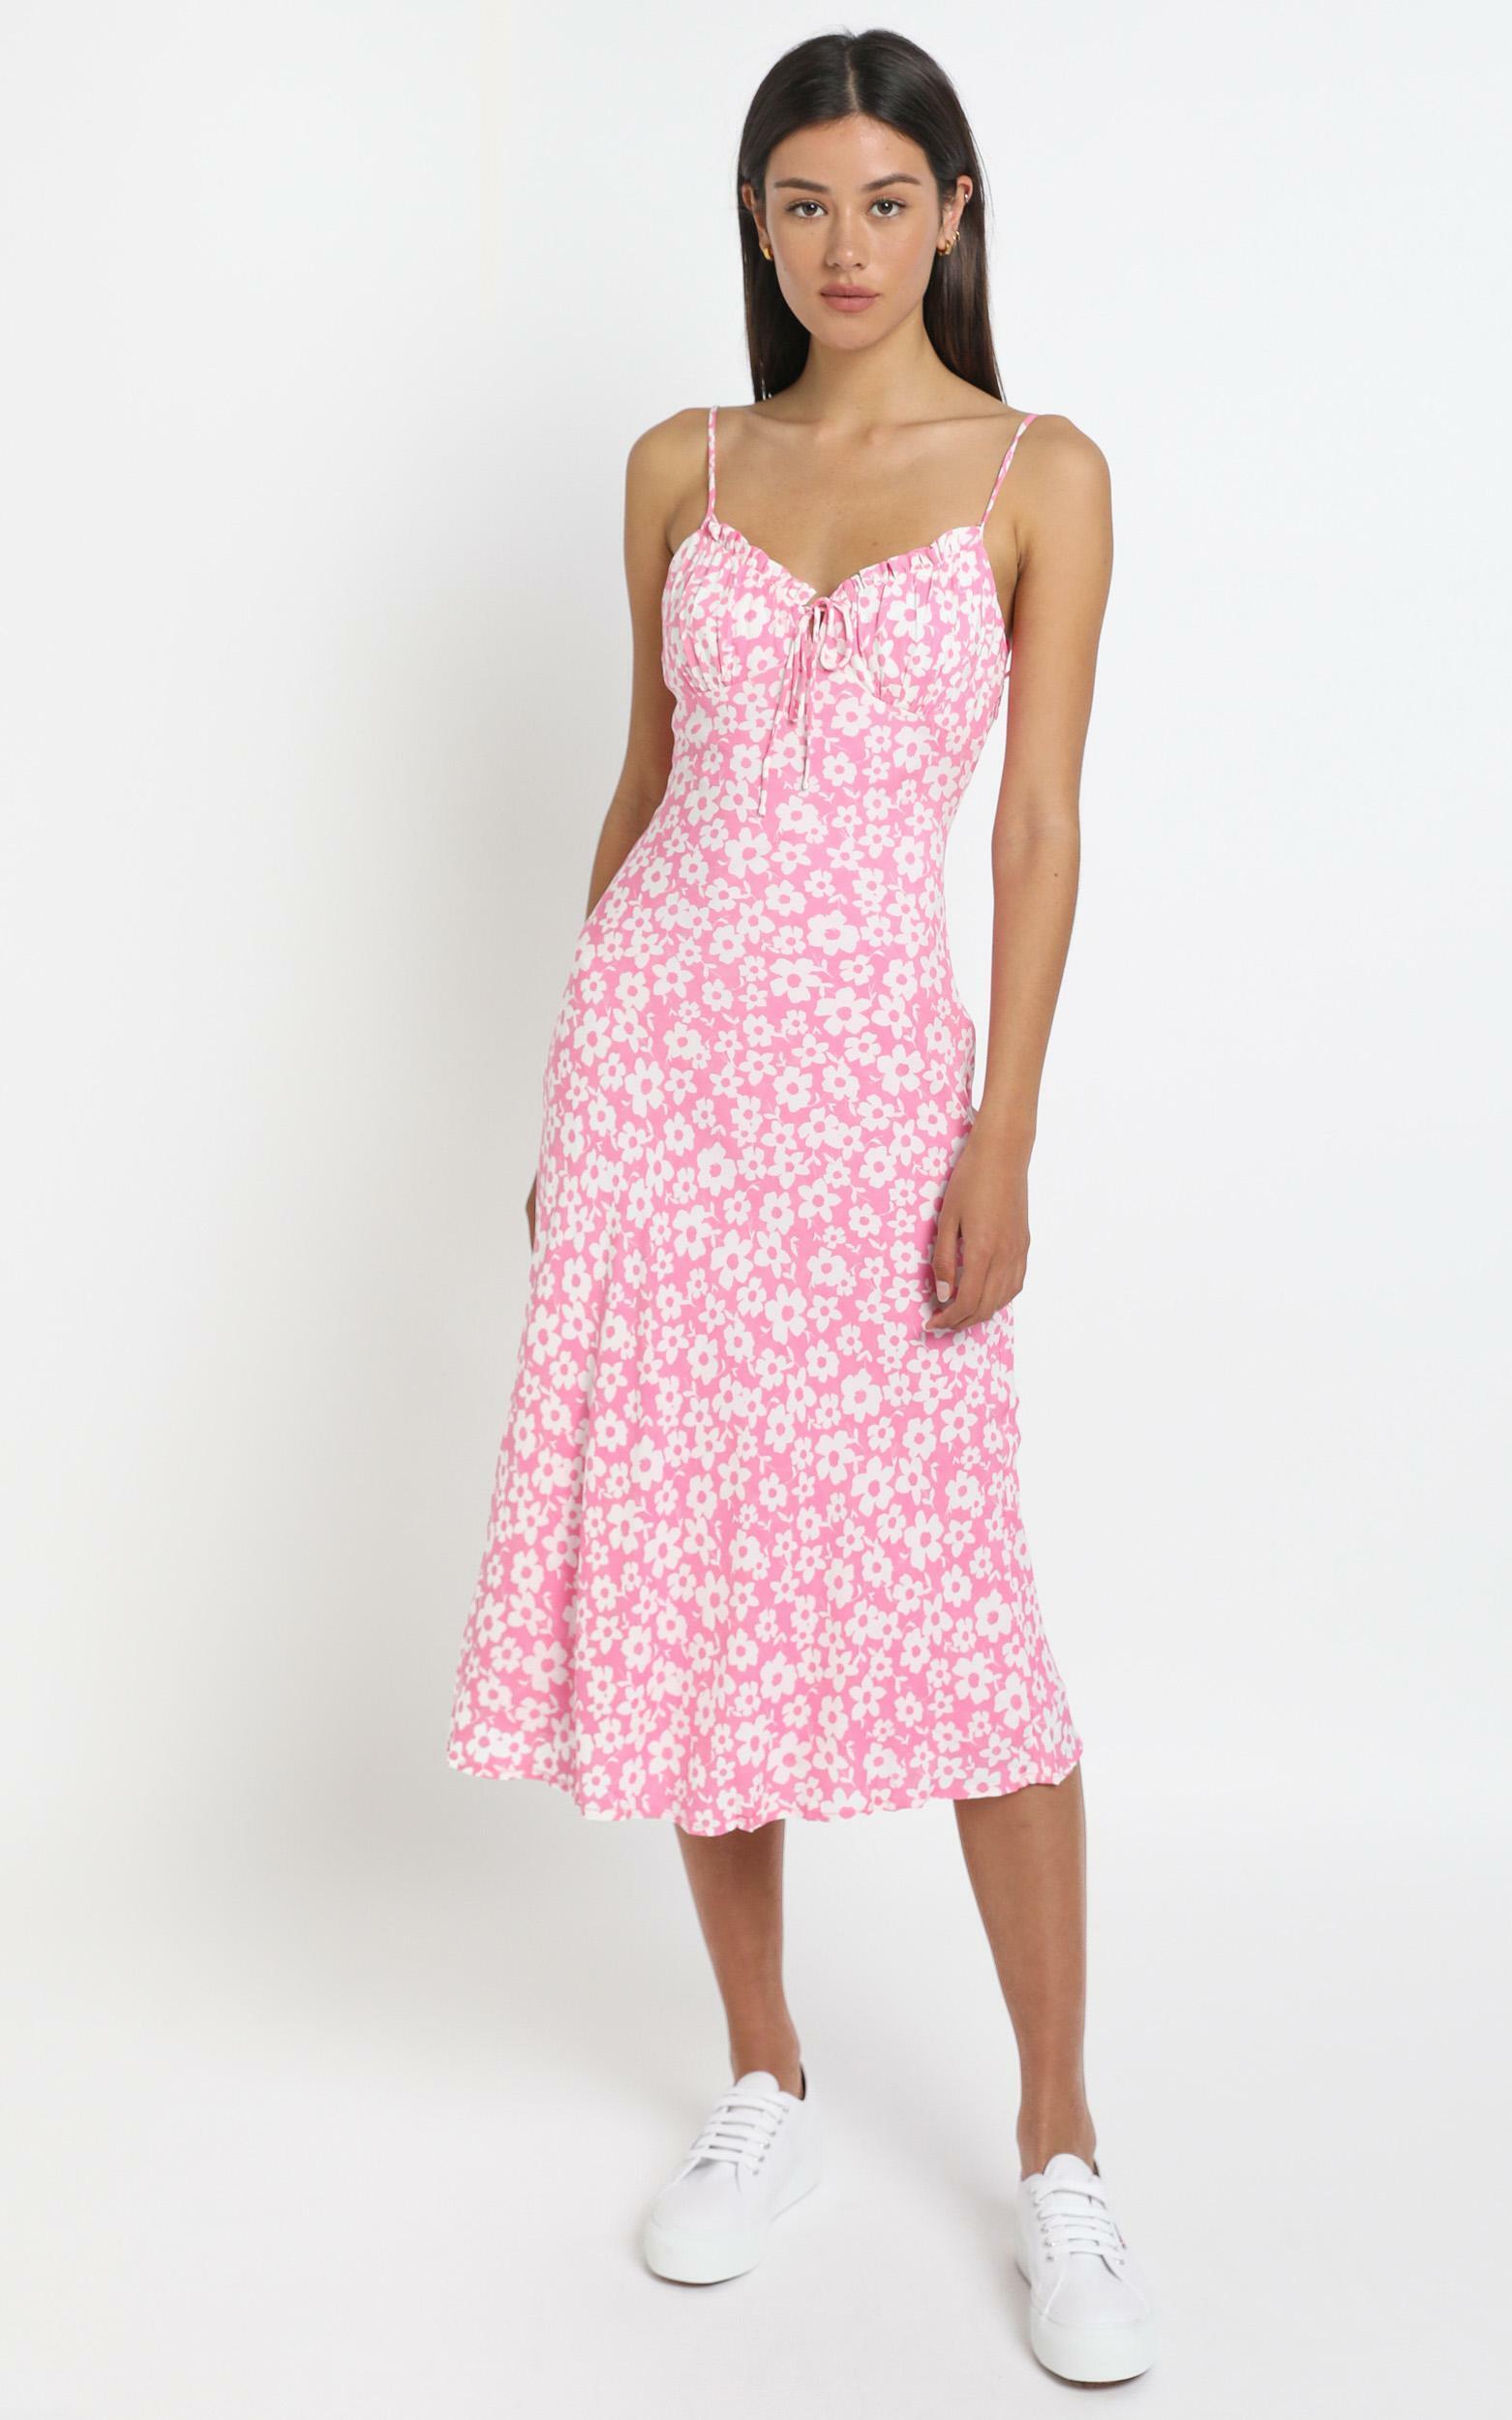 Massachusetts Dress in pink - 8 (S), PNK1, hi-res image number null